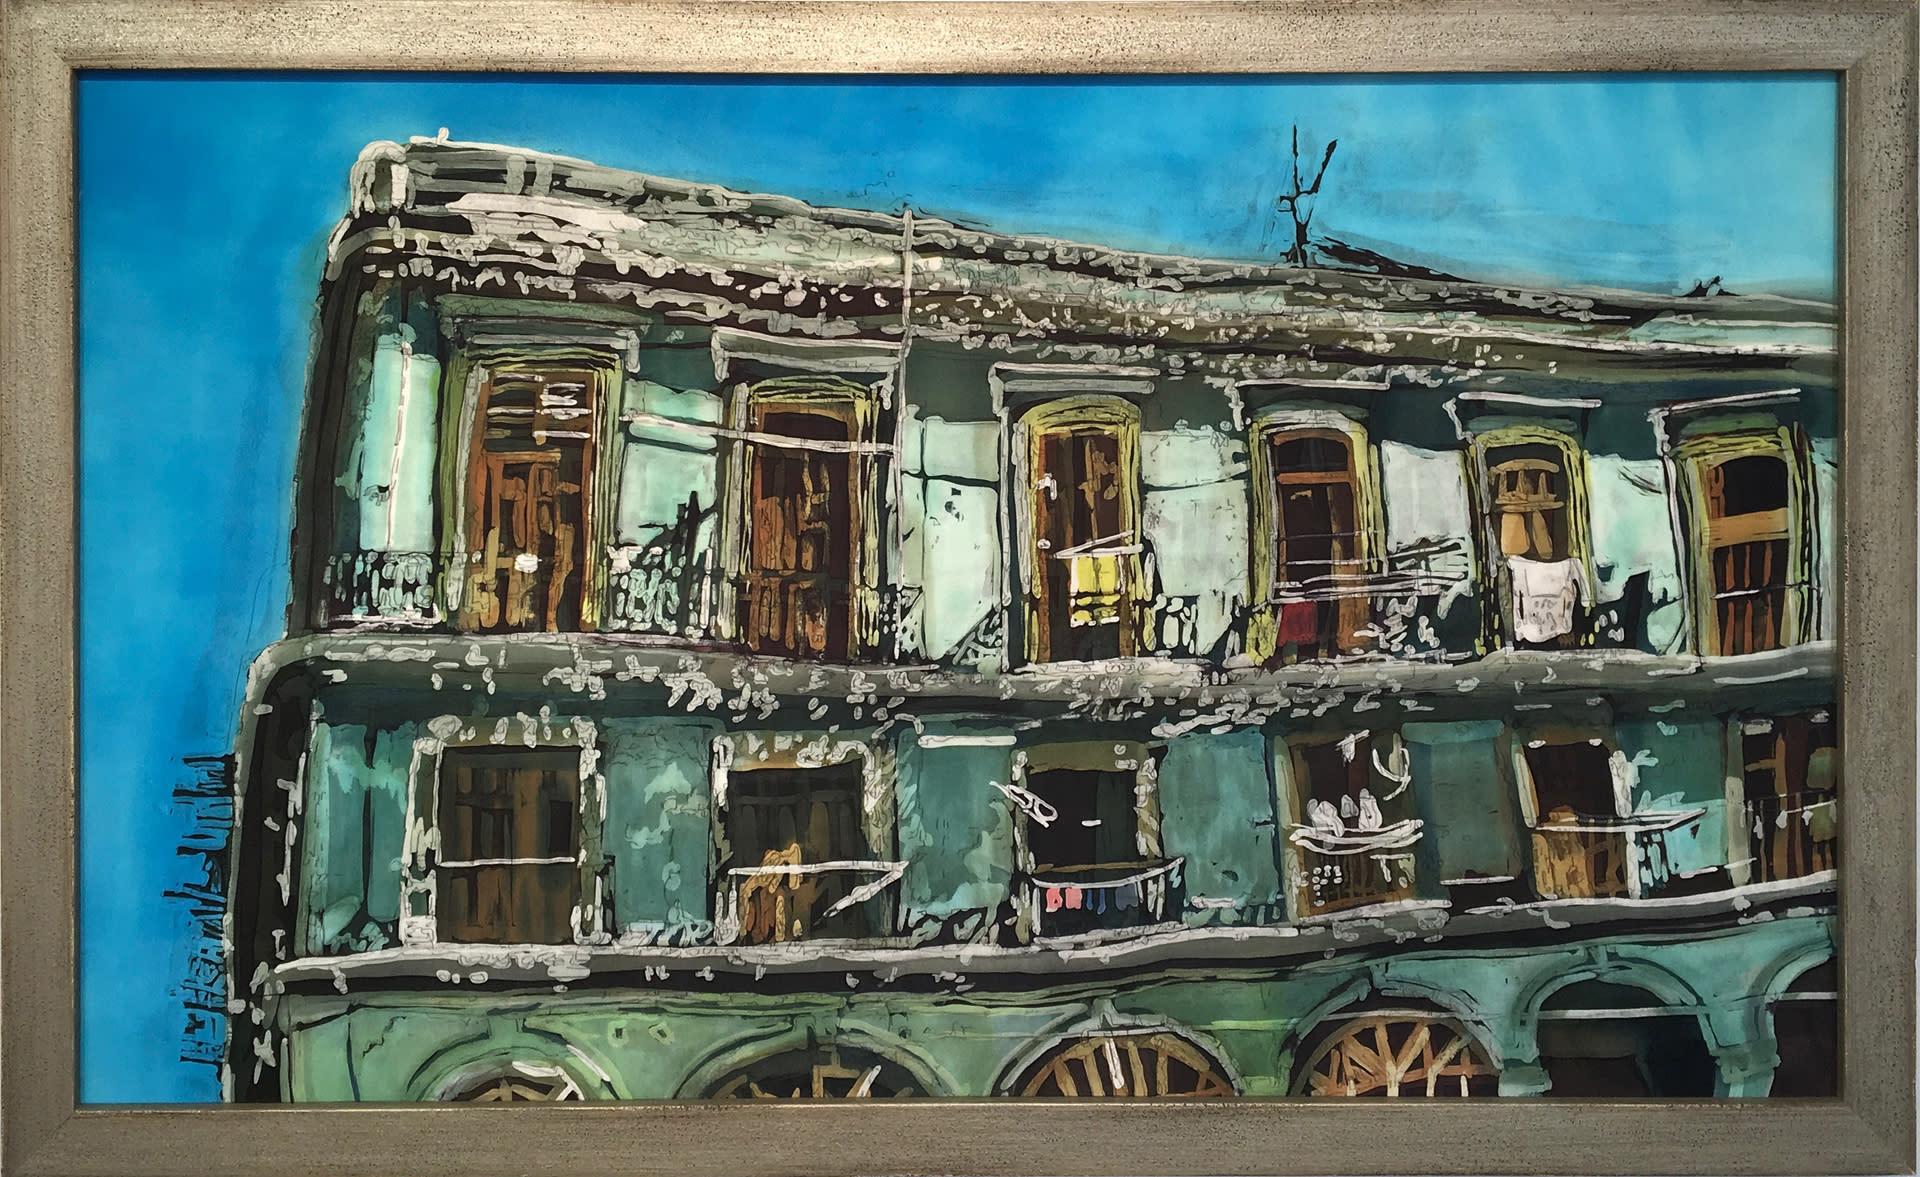 Balconies framed tyoupf